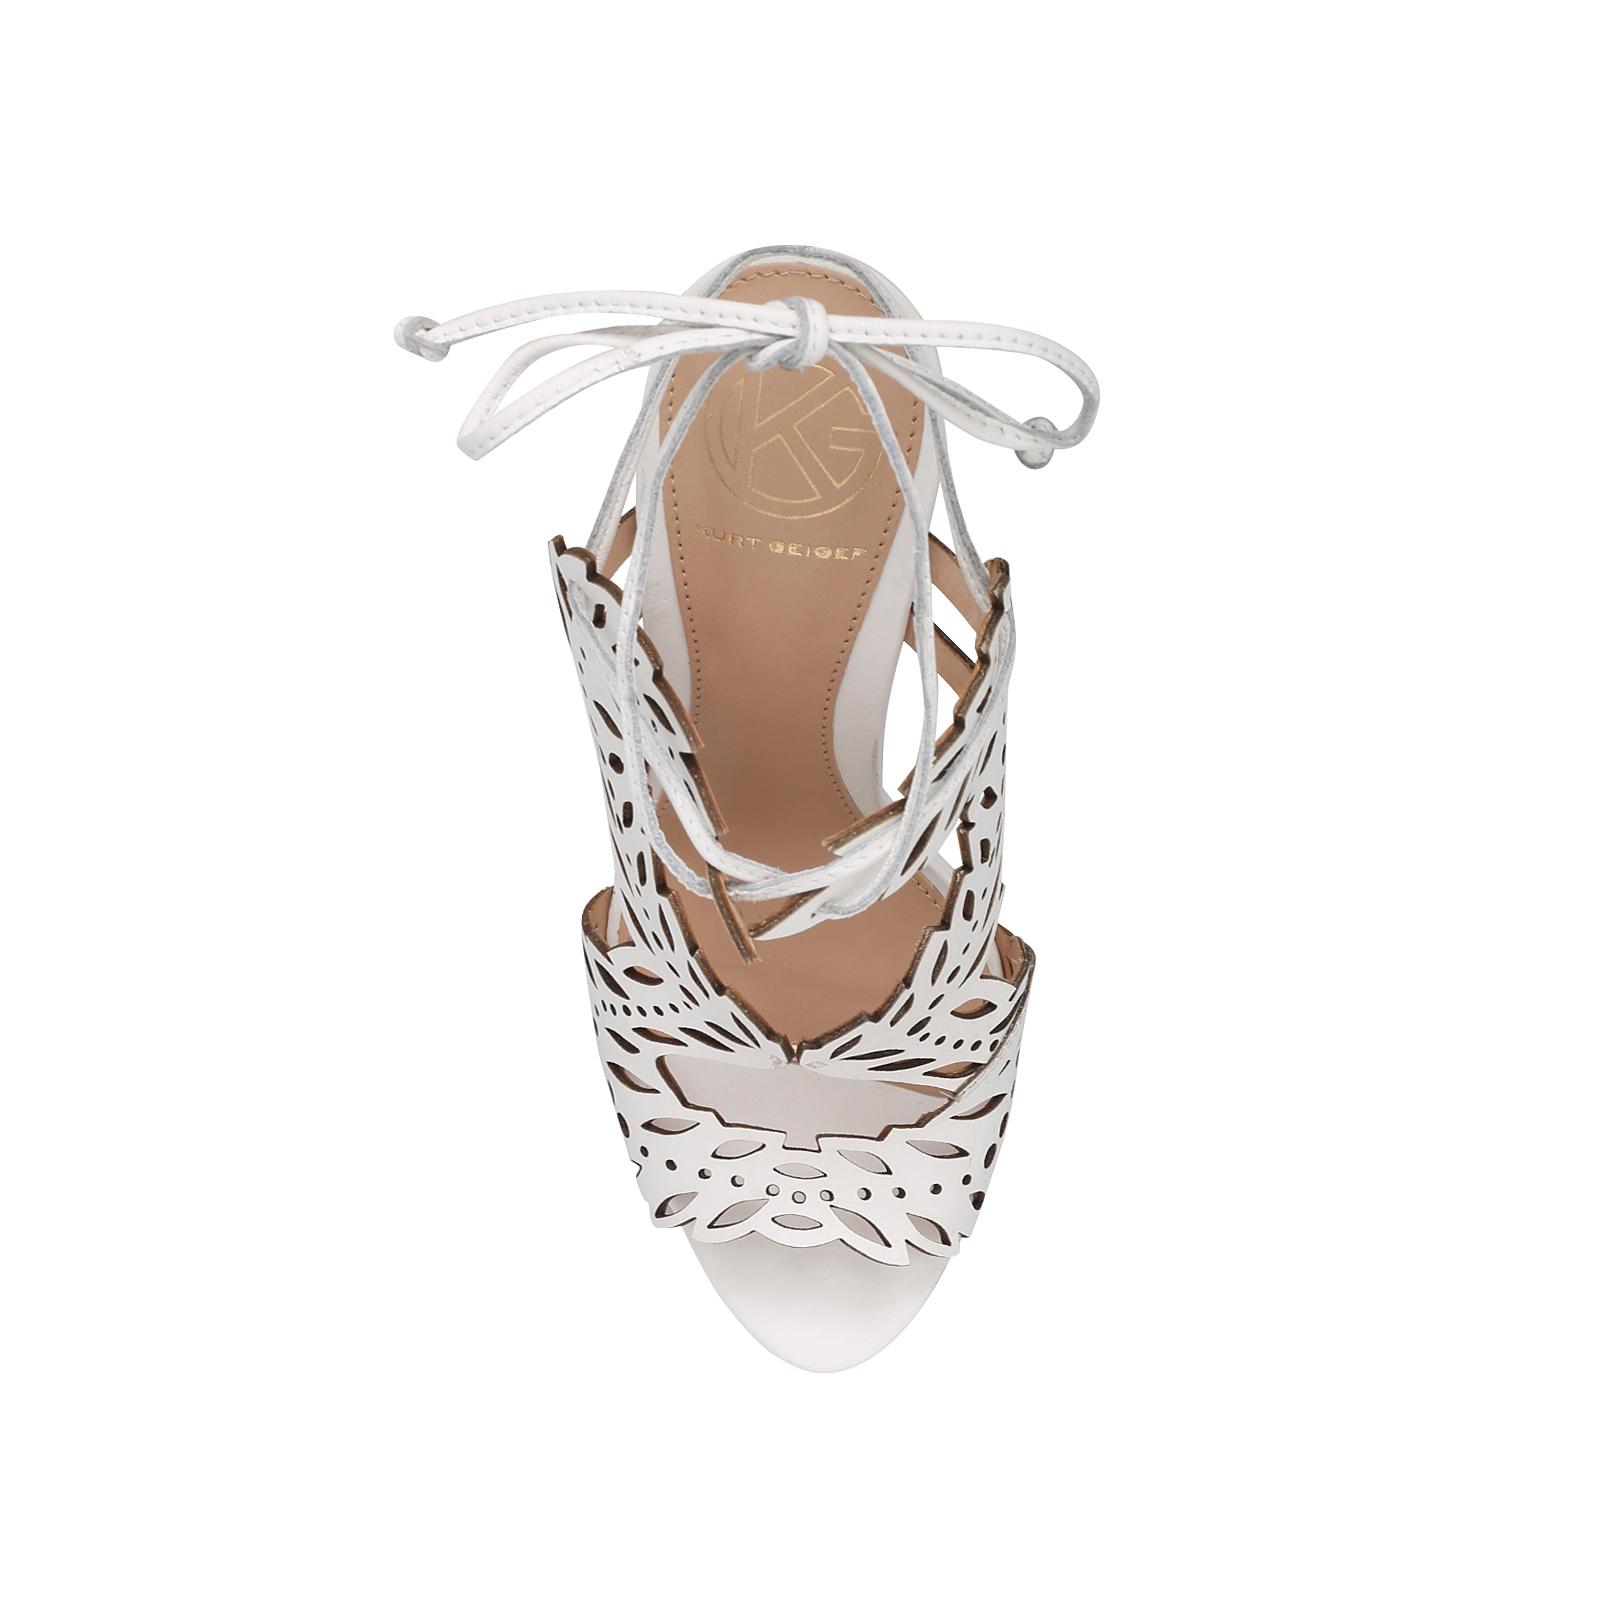 d7775a220ea HORATIO KG Kurt Geiger Horatio White Leather High Heel Sandals by KG ...